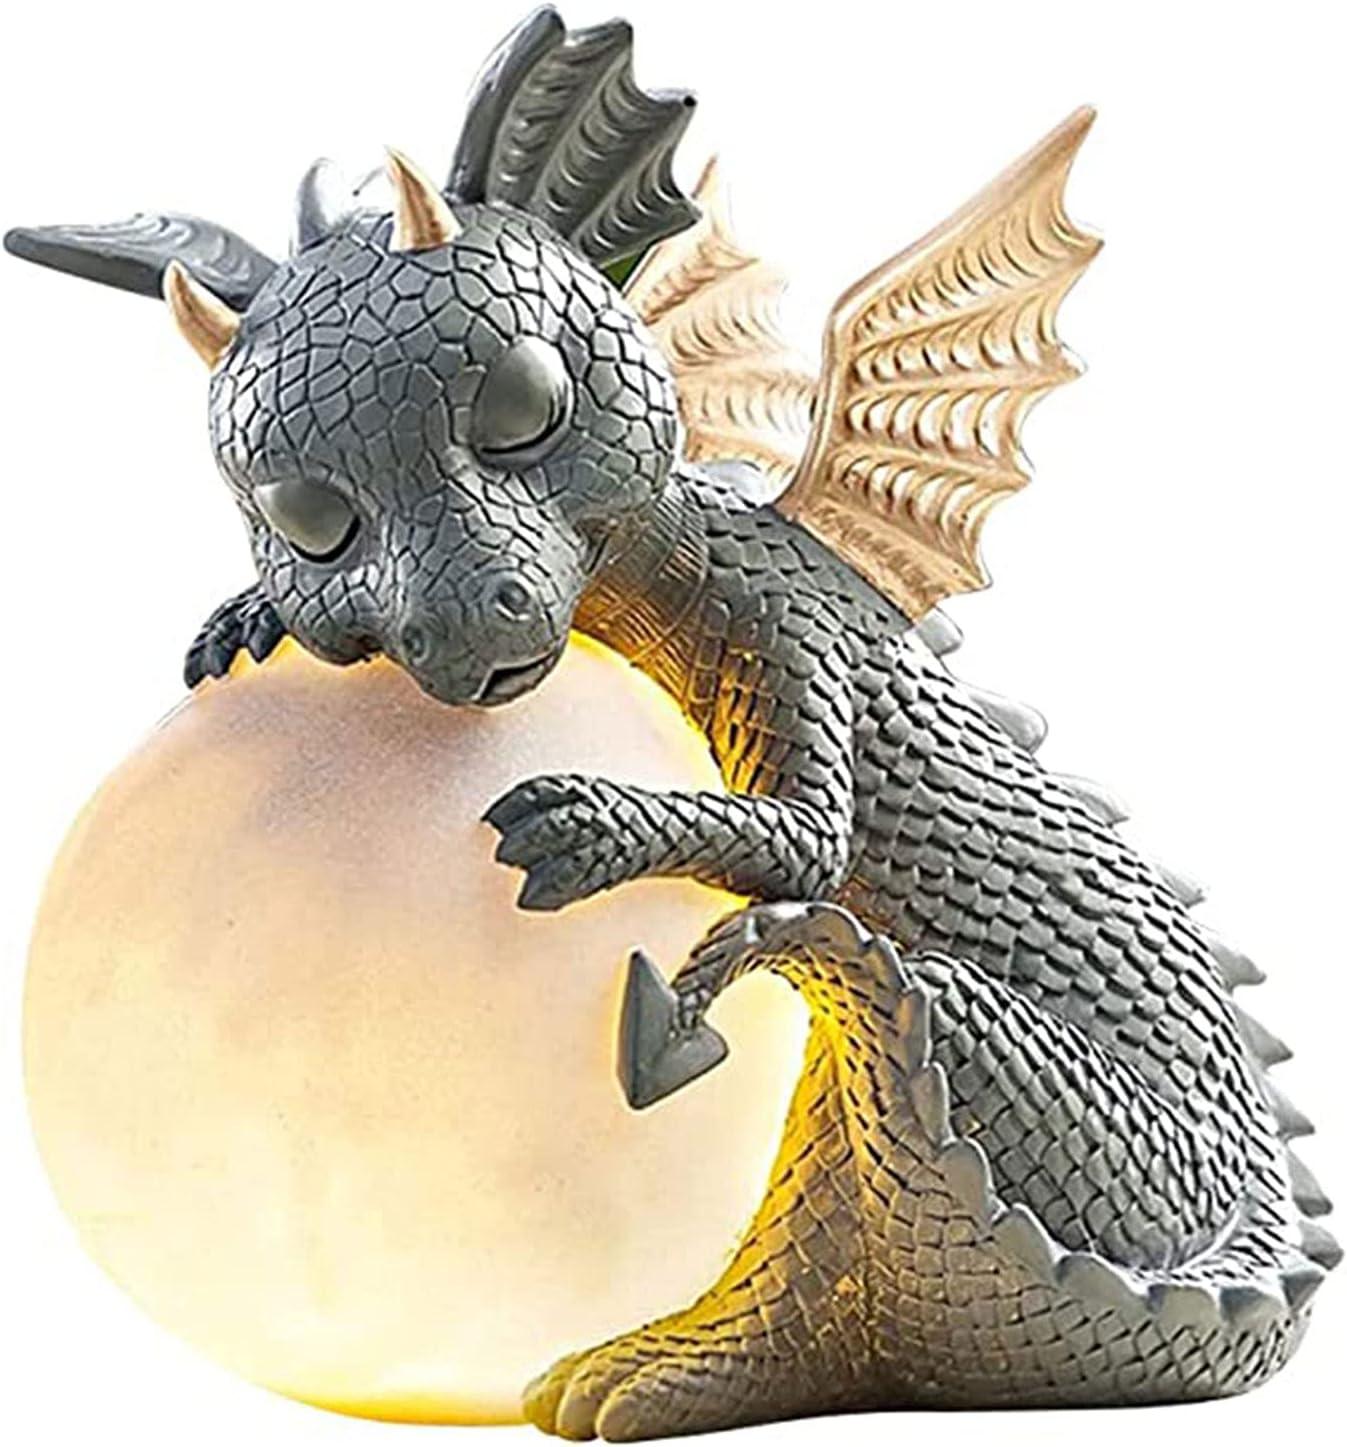 Outdoor Statues Spring new work 6 Inch Dragon mysticalls Resin Garden Max 51% OFF